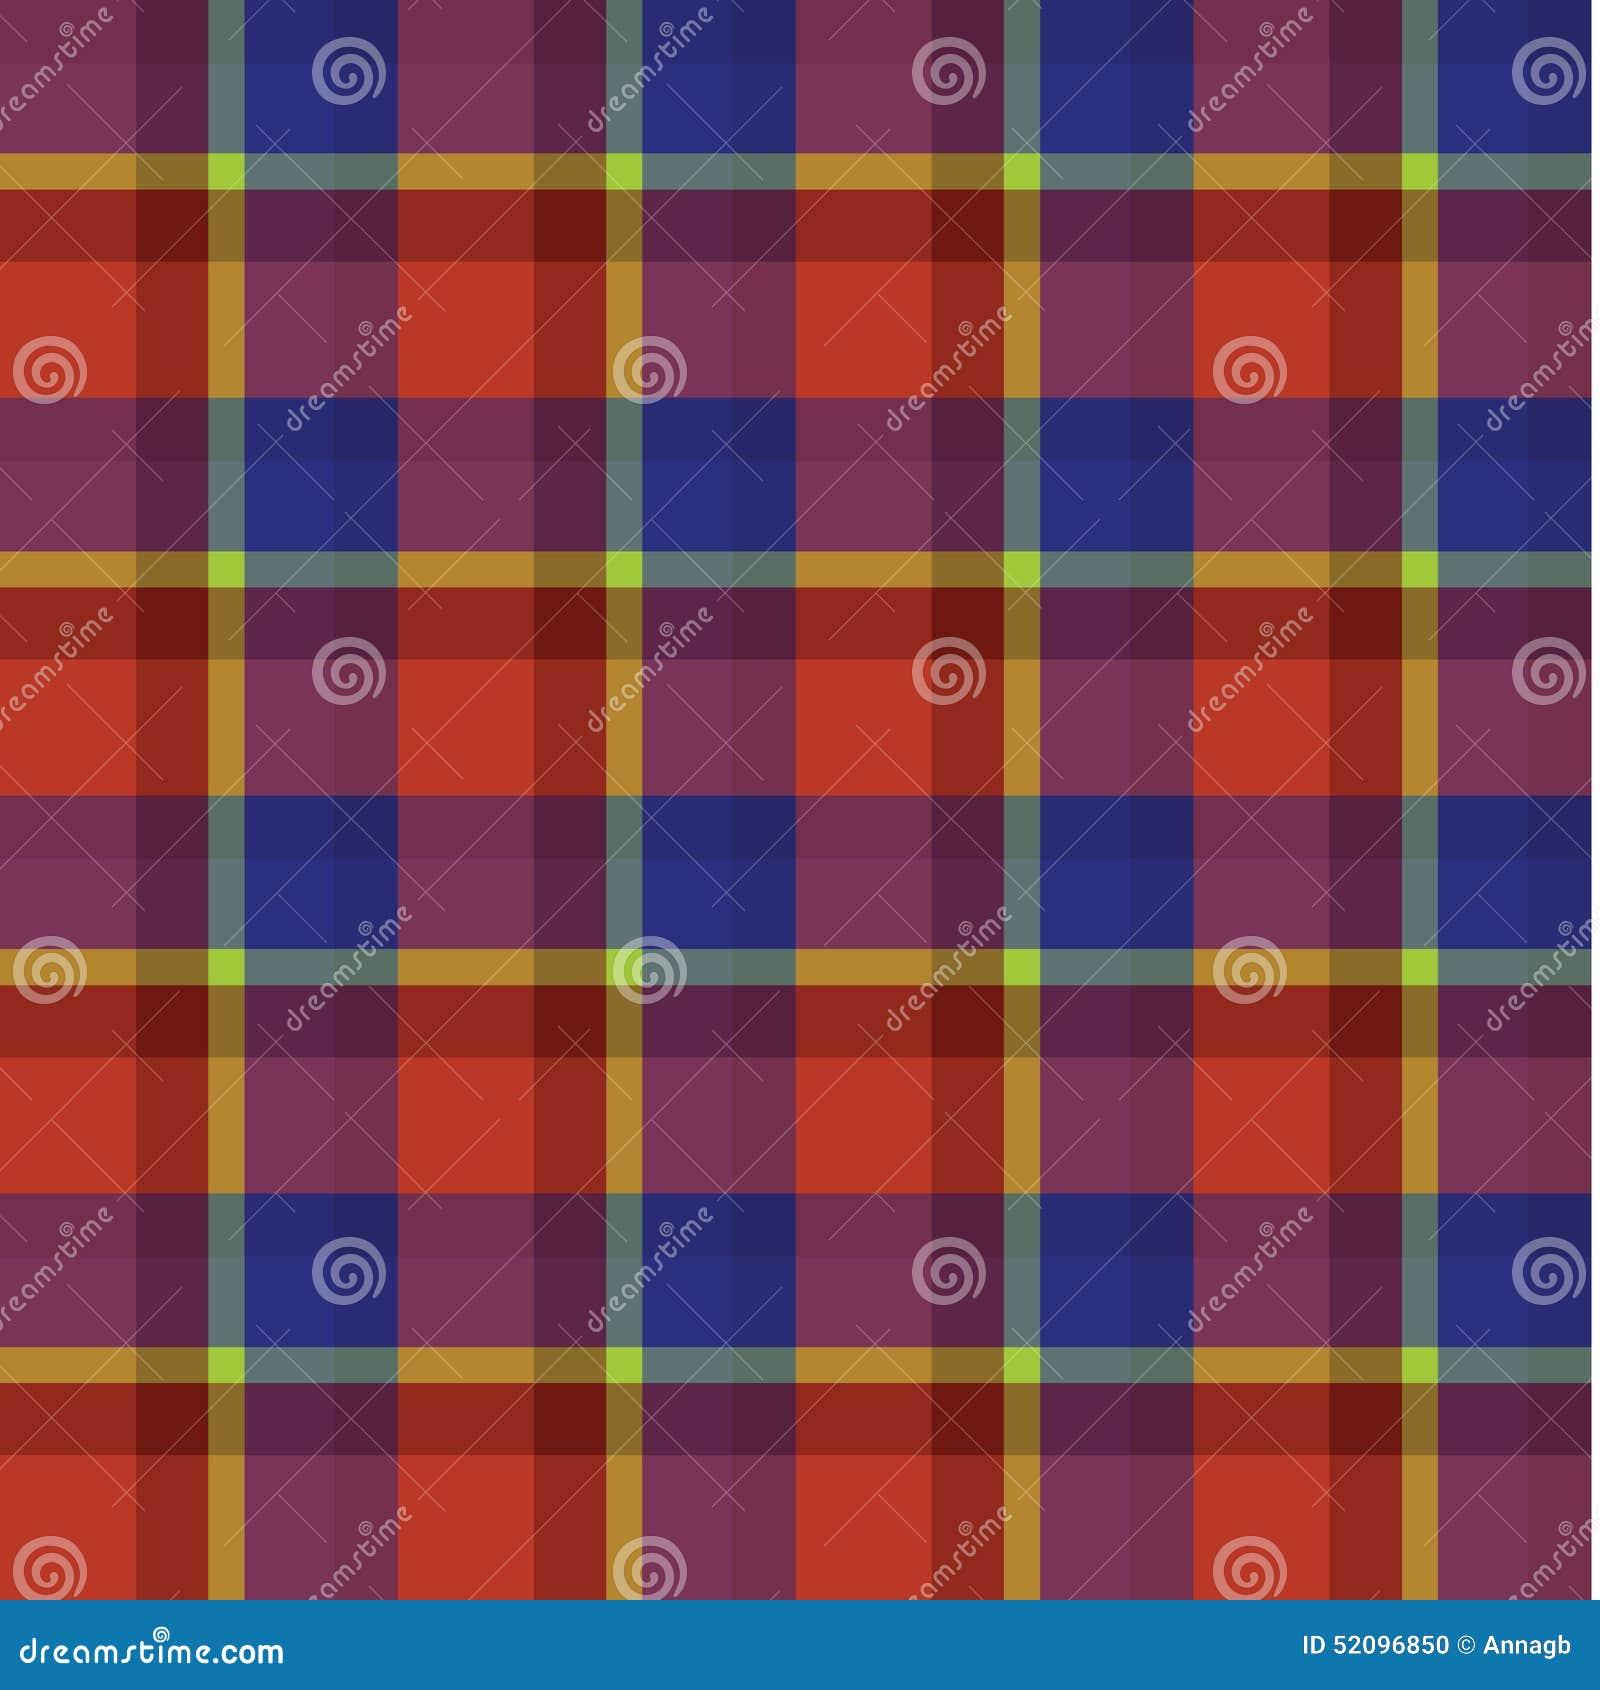 fcea34db4a Red Blue Yellow Tartan Scottish Plaid Background Pattern Vector ...